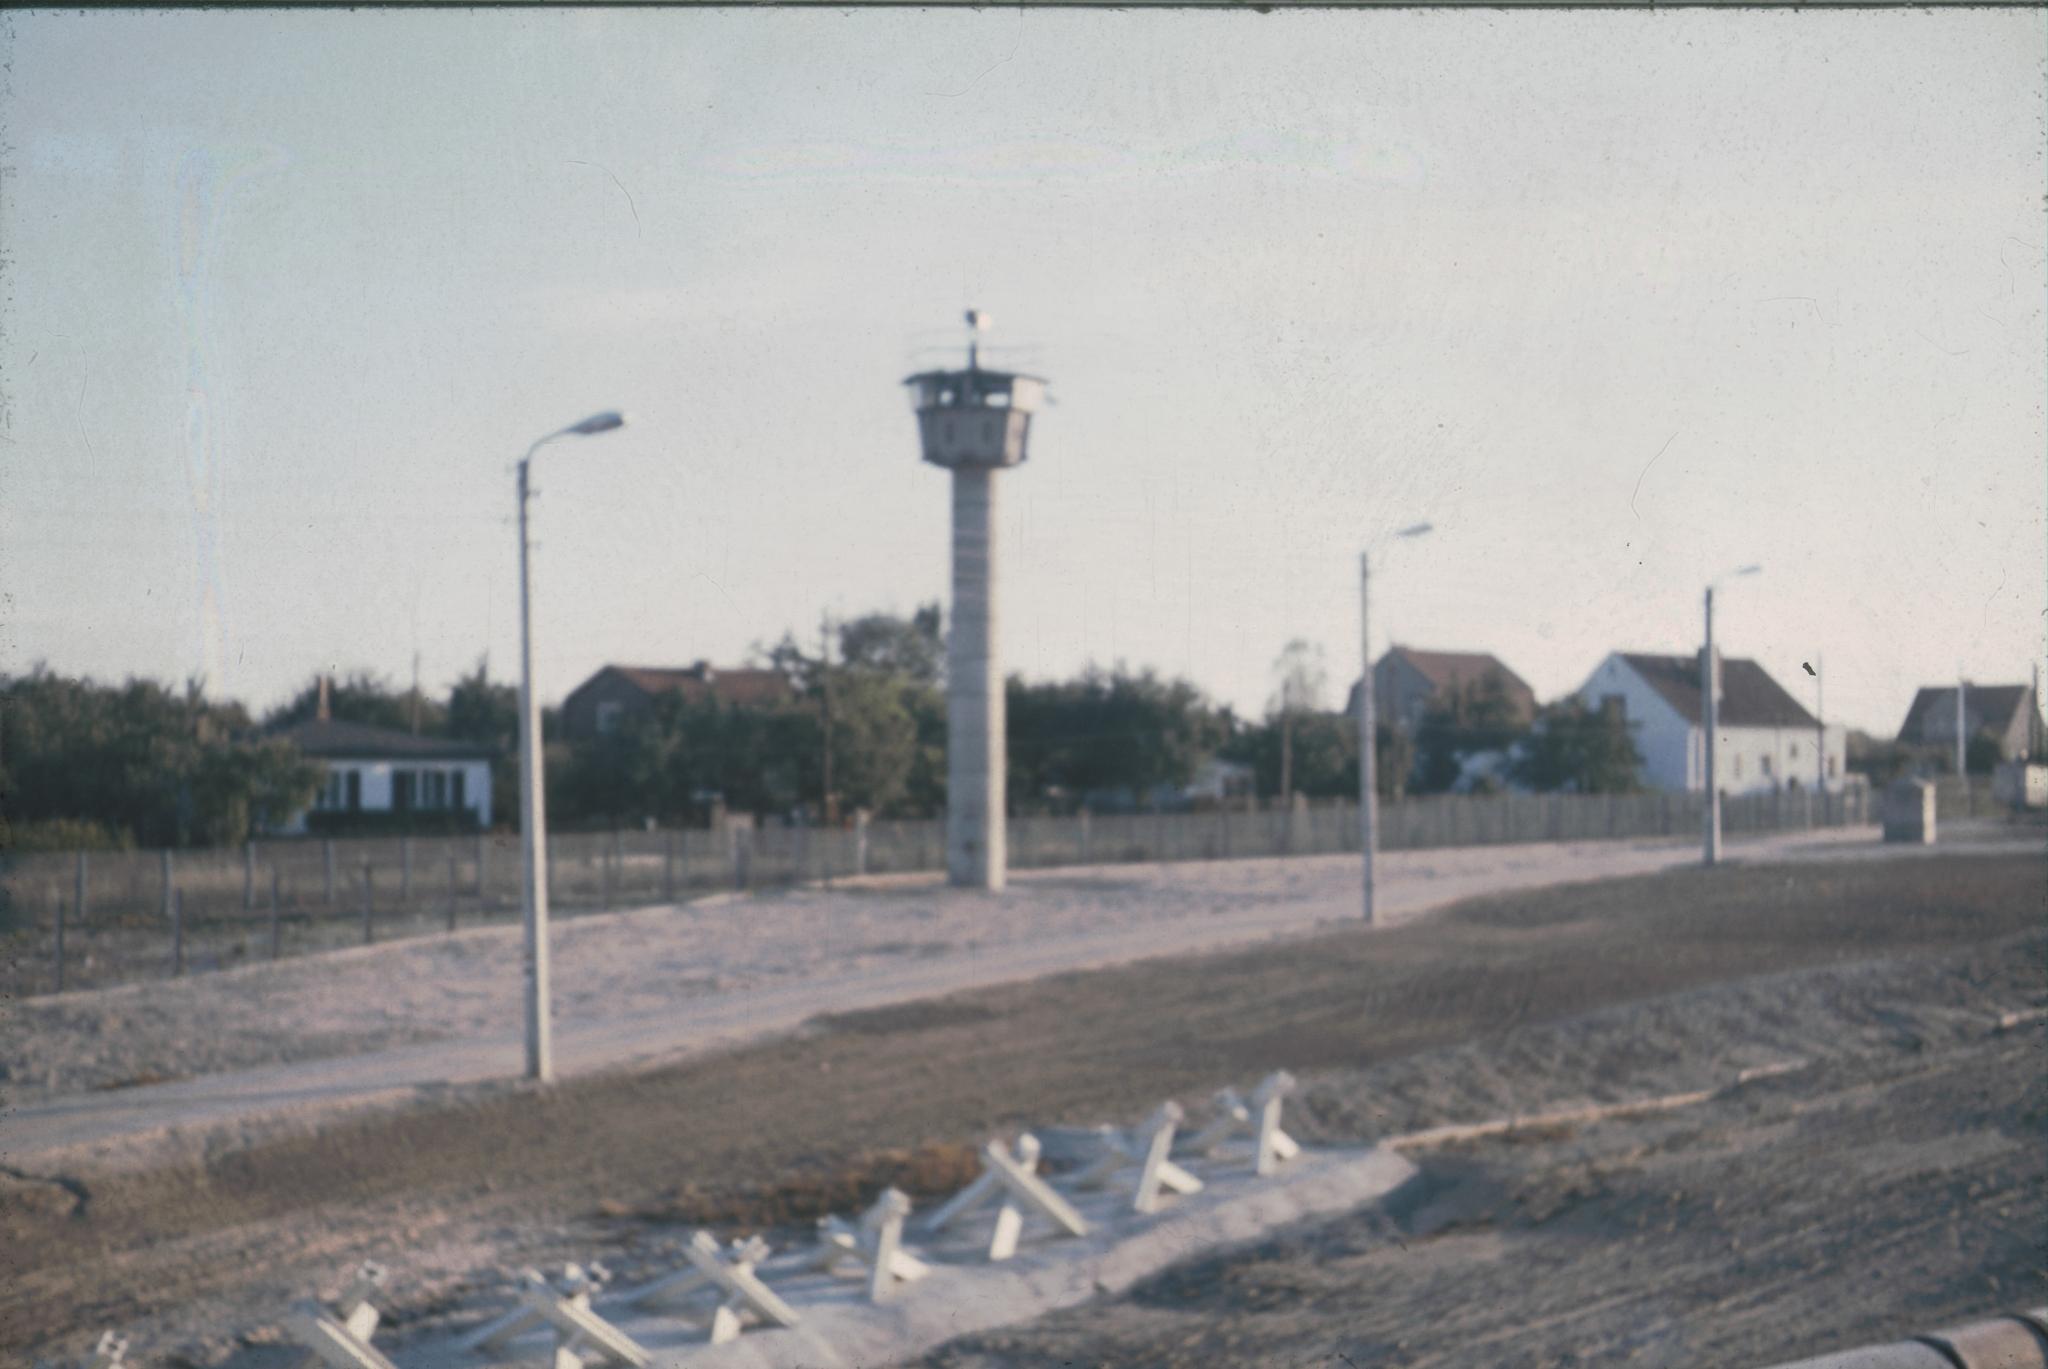 Die Berliner Mauer um 1973 - Berlin Wall - Daniel Rohde-Kage 58